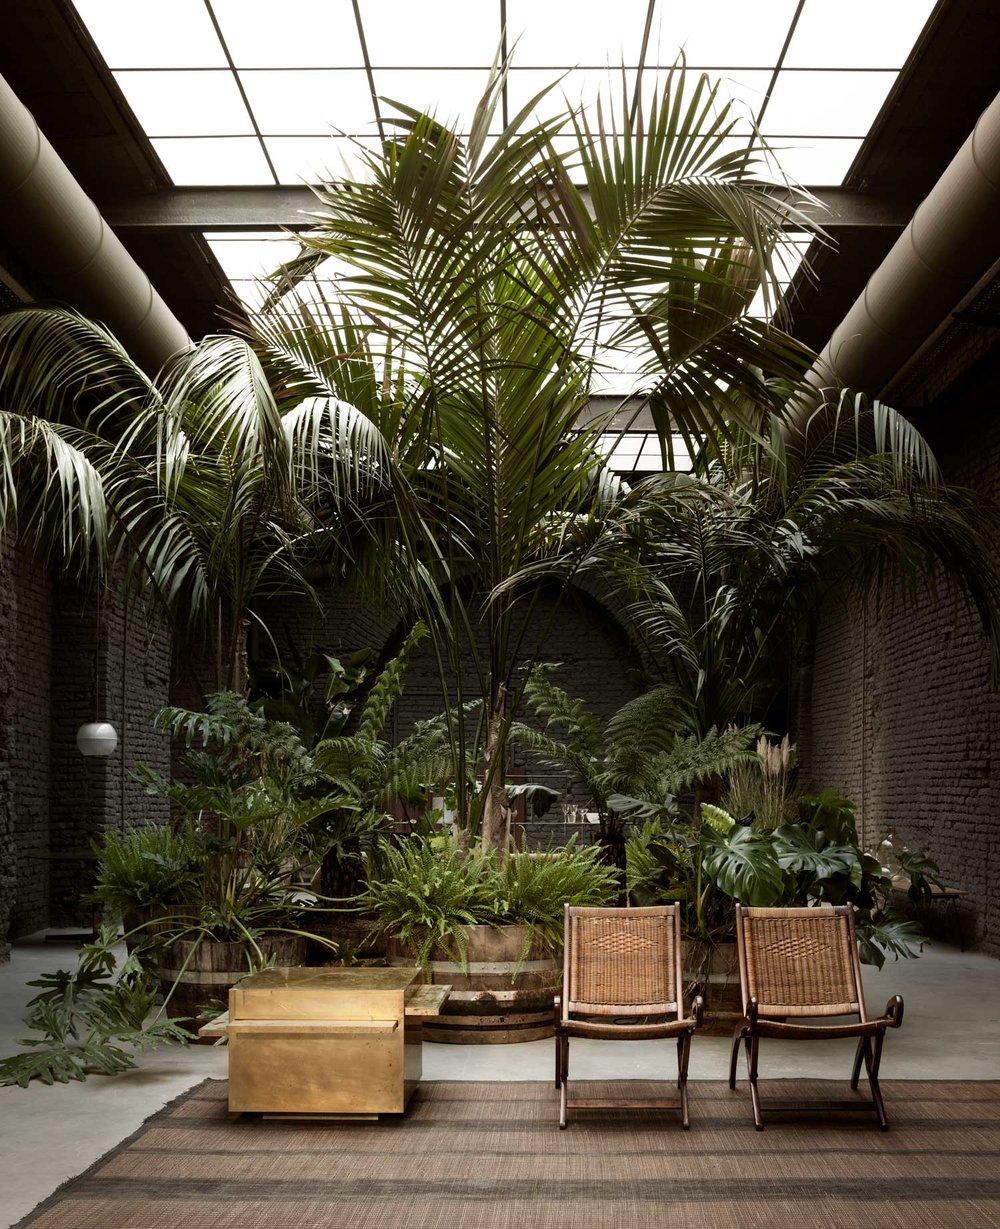 SIX-Brings-Together-A-Gallery-Bistro-Design-Boutique-in-Milan design week.jpg